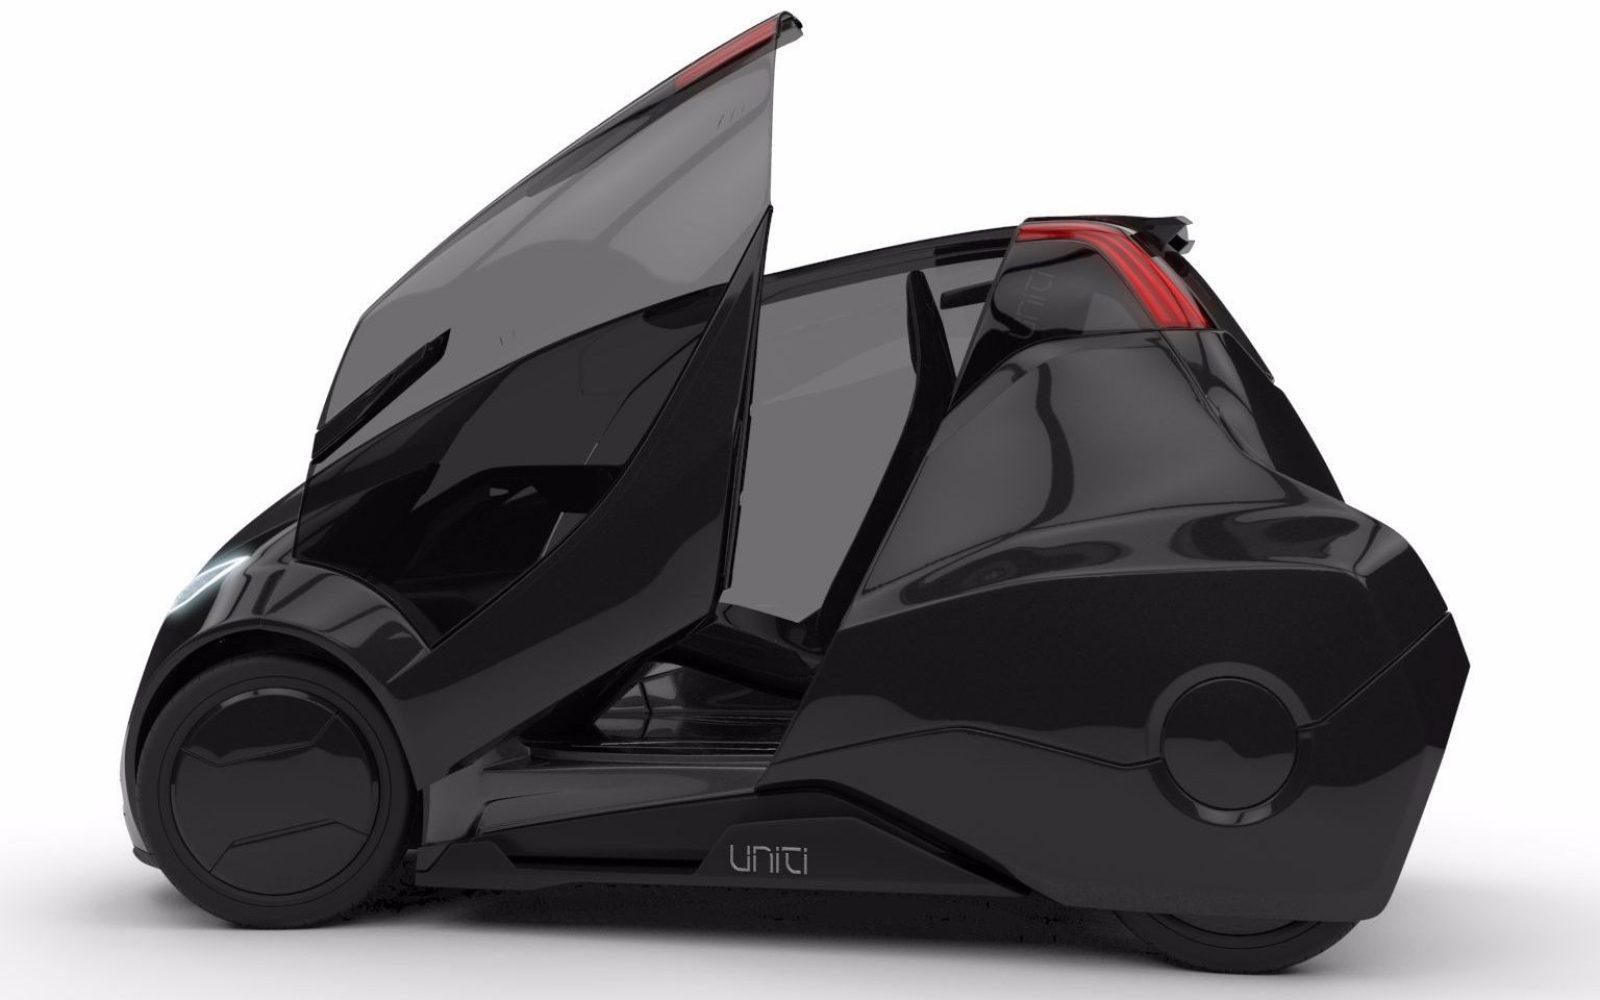 Electric car startup 'Uniti' raises over $1 million through crowdfunding to bring to market their EV concept